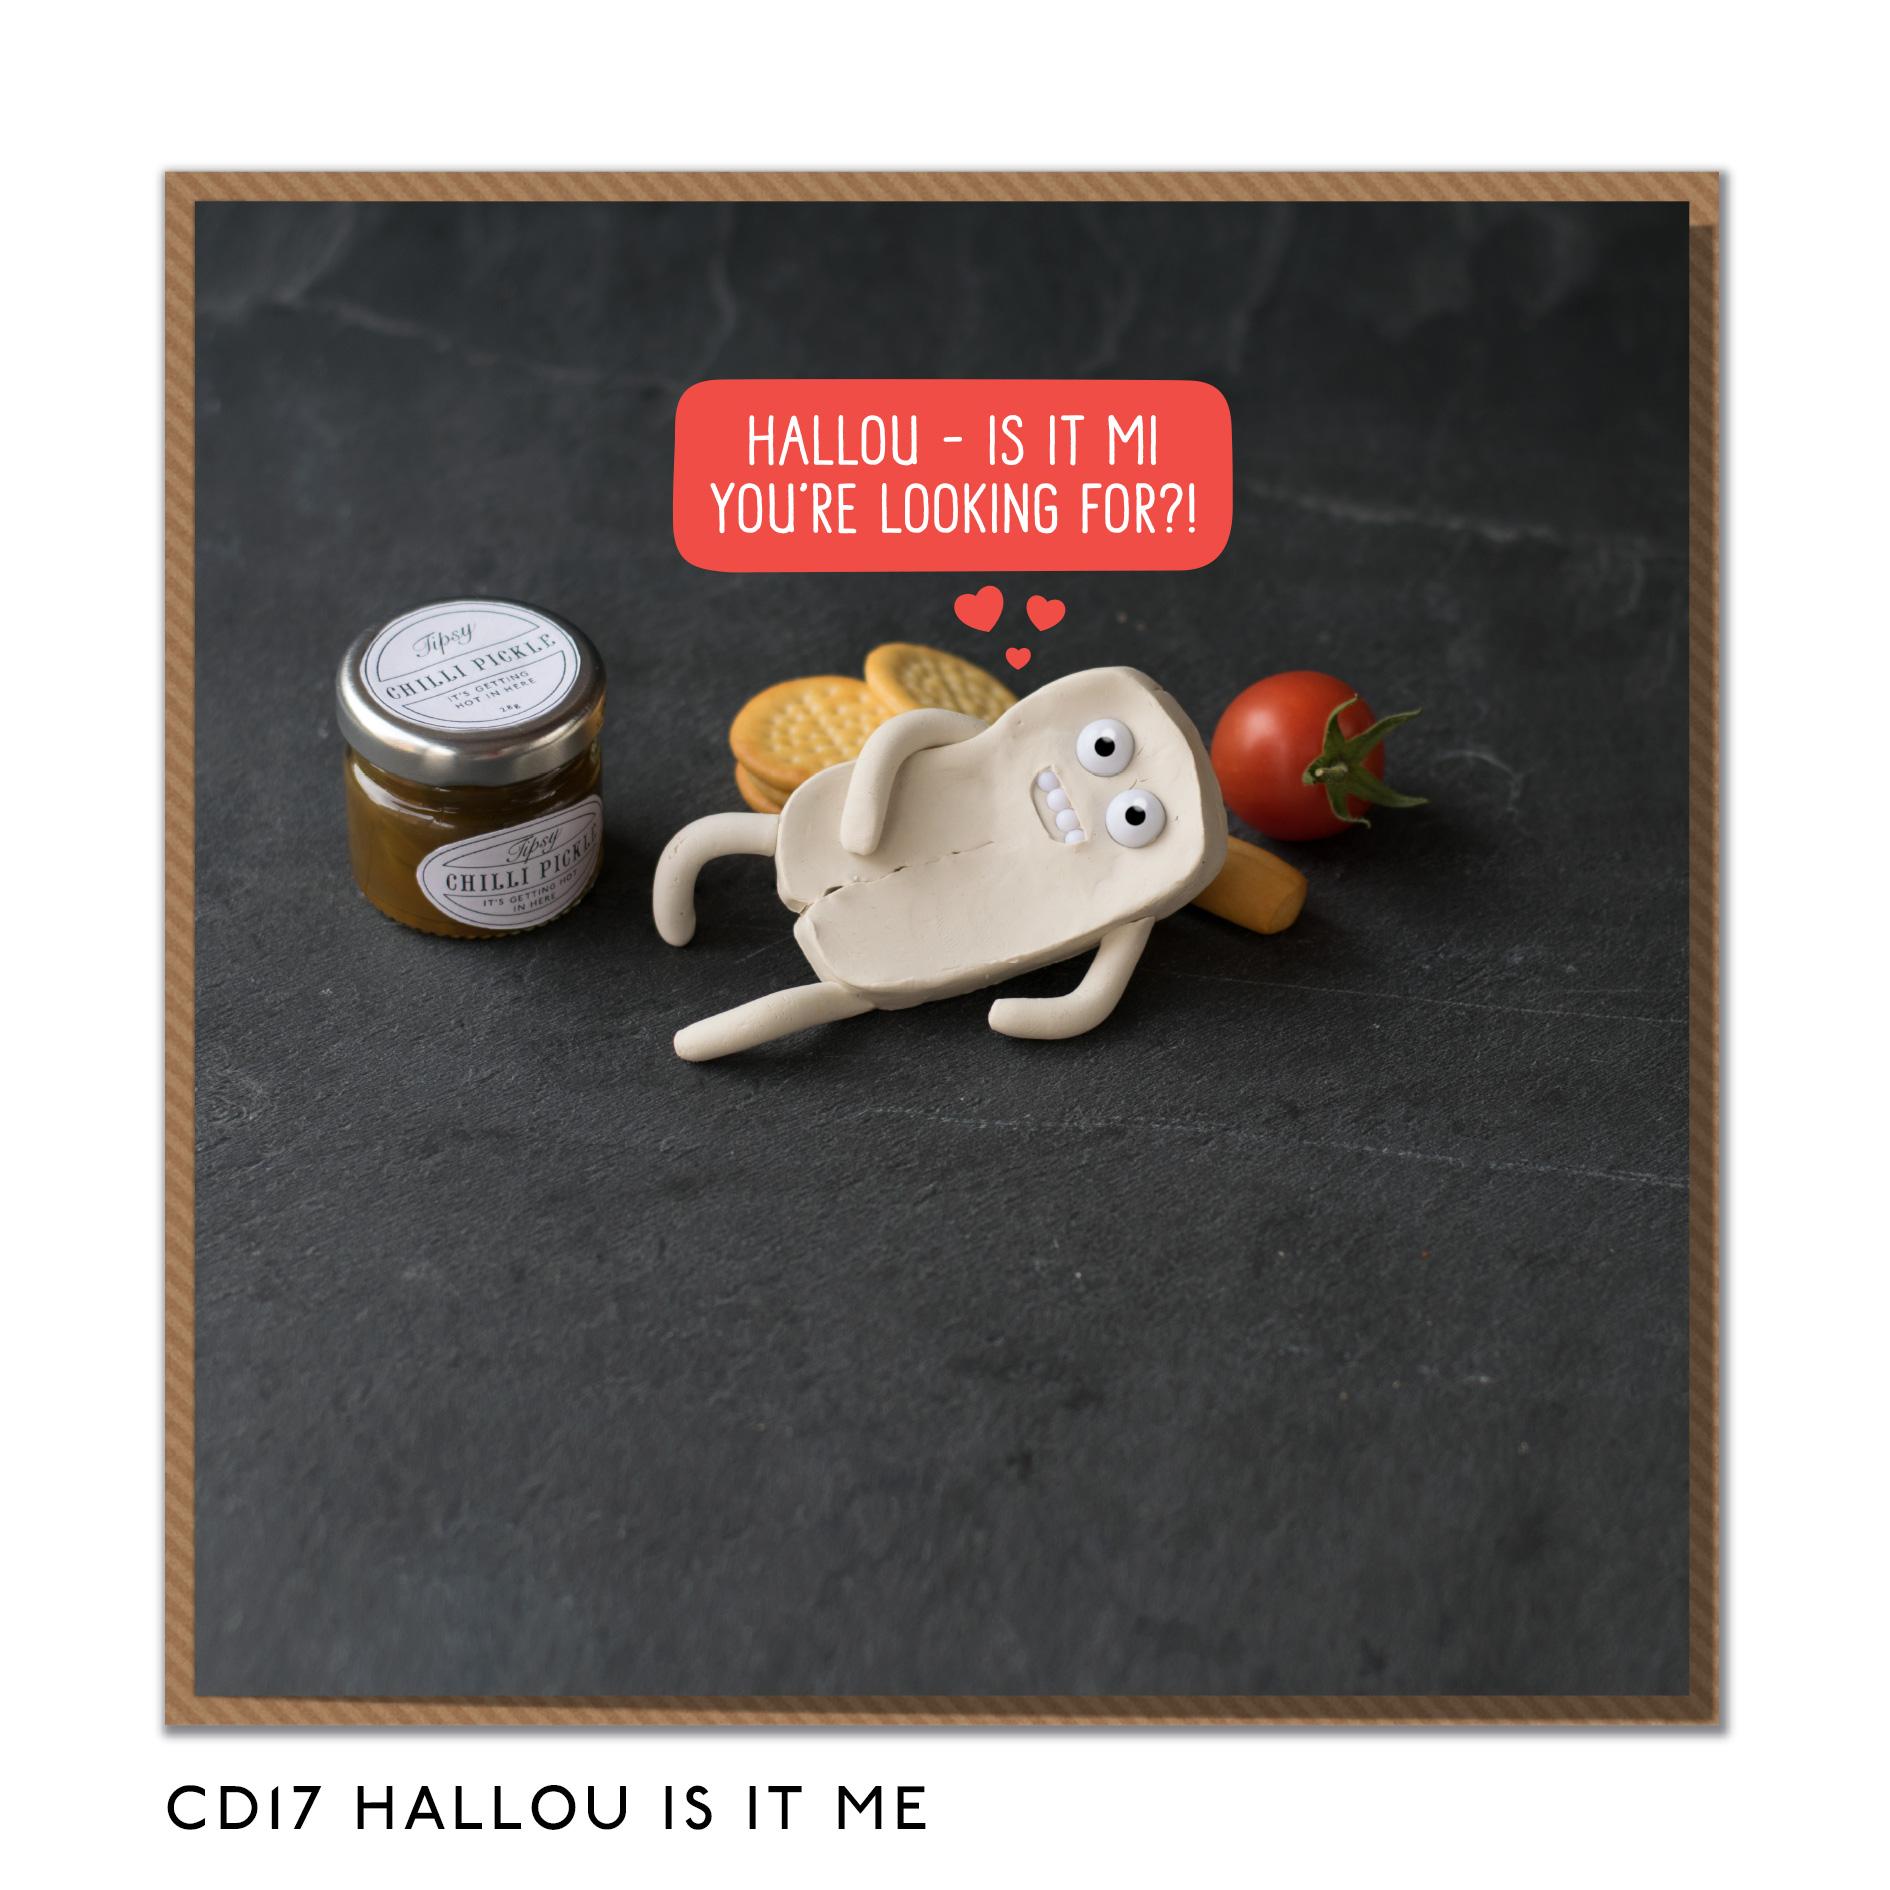 CD17-HALLOU-IS-IT-ME.jpg